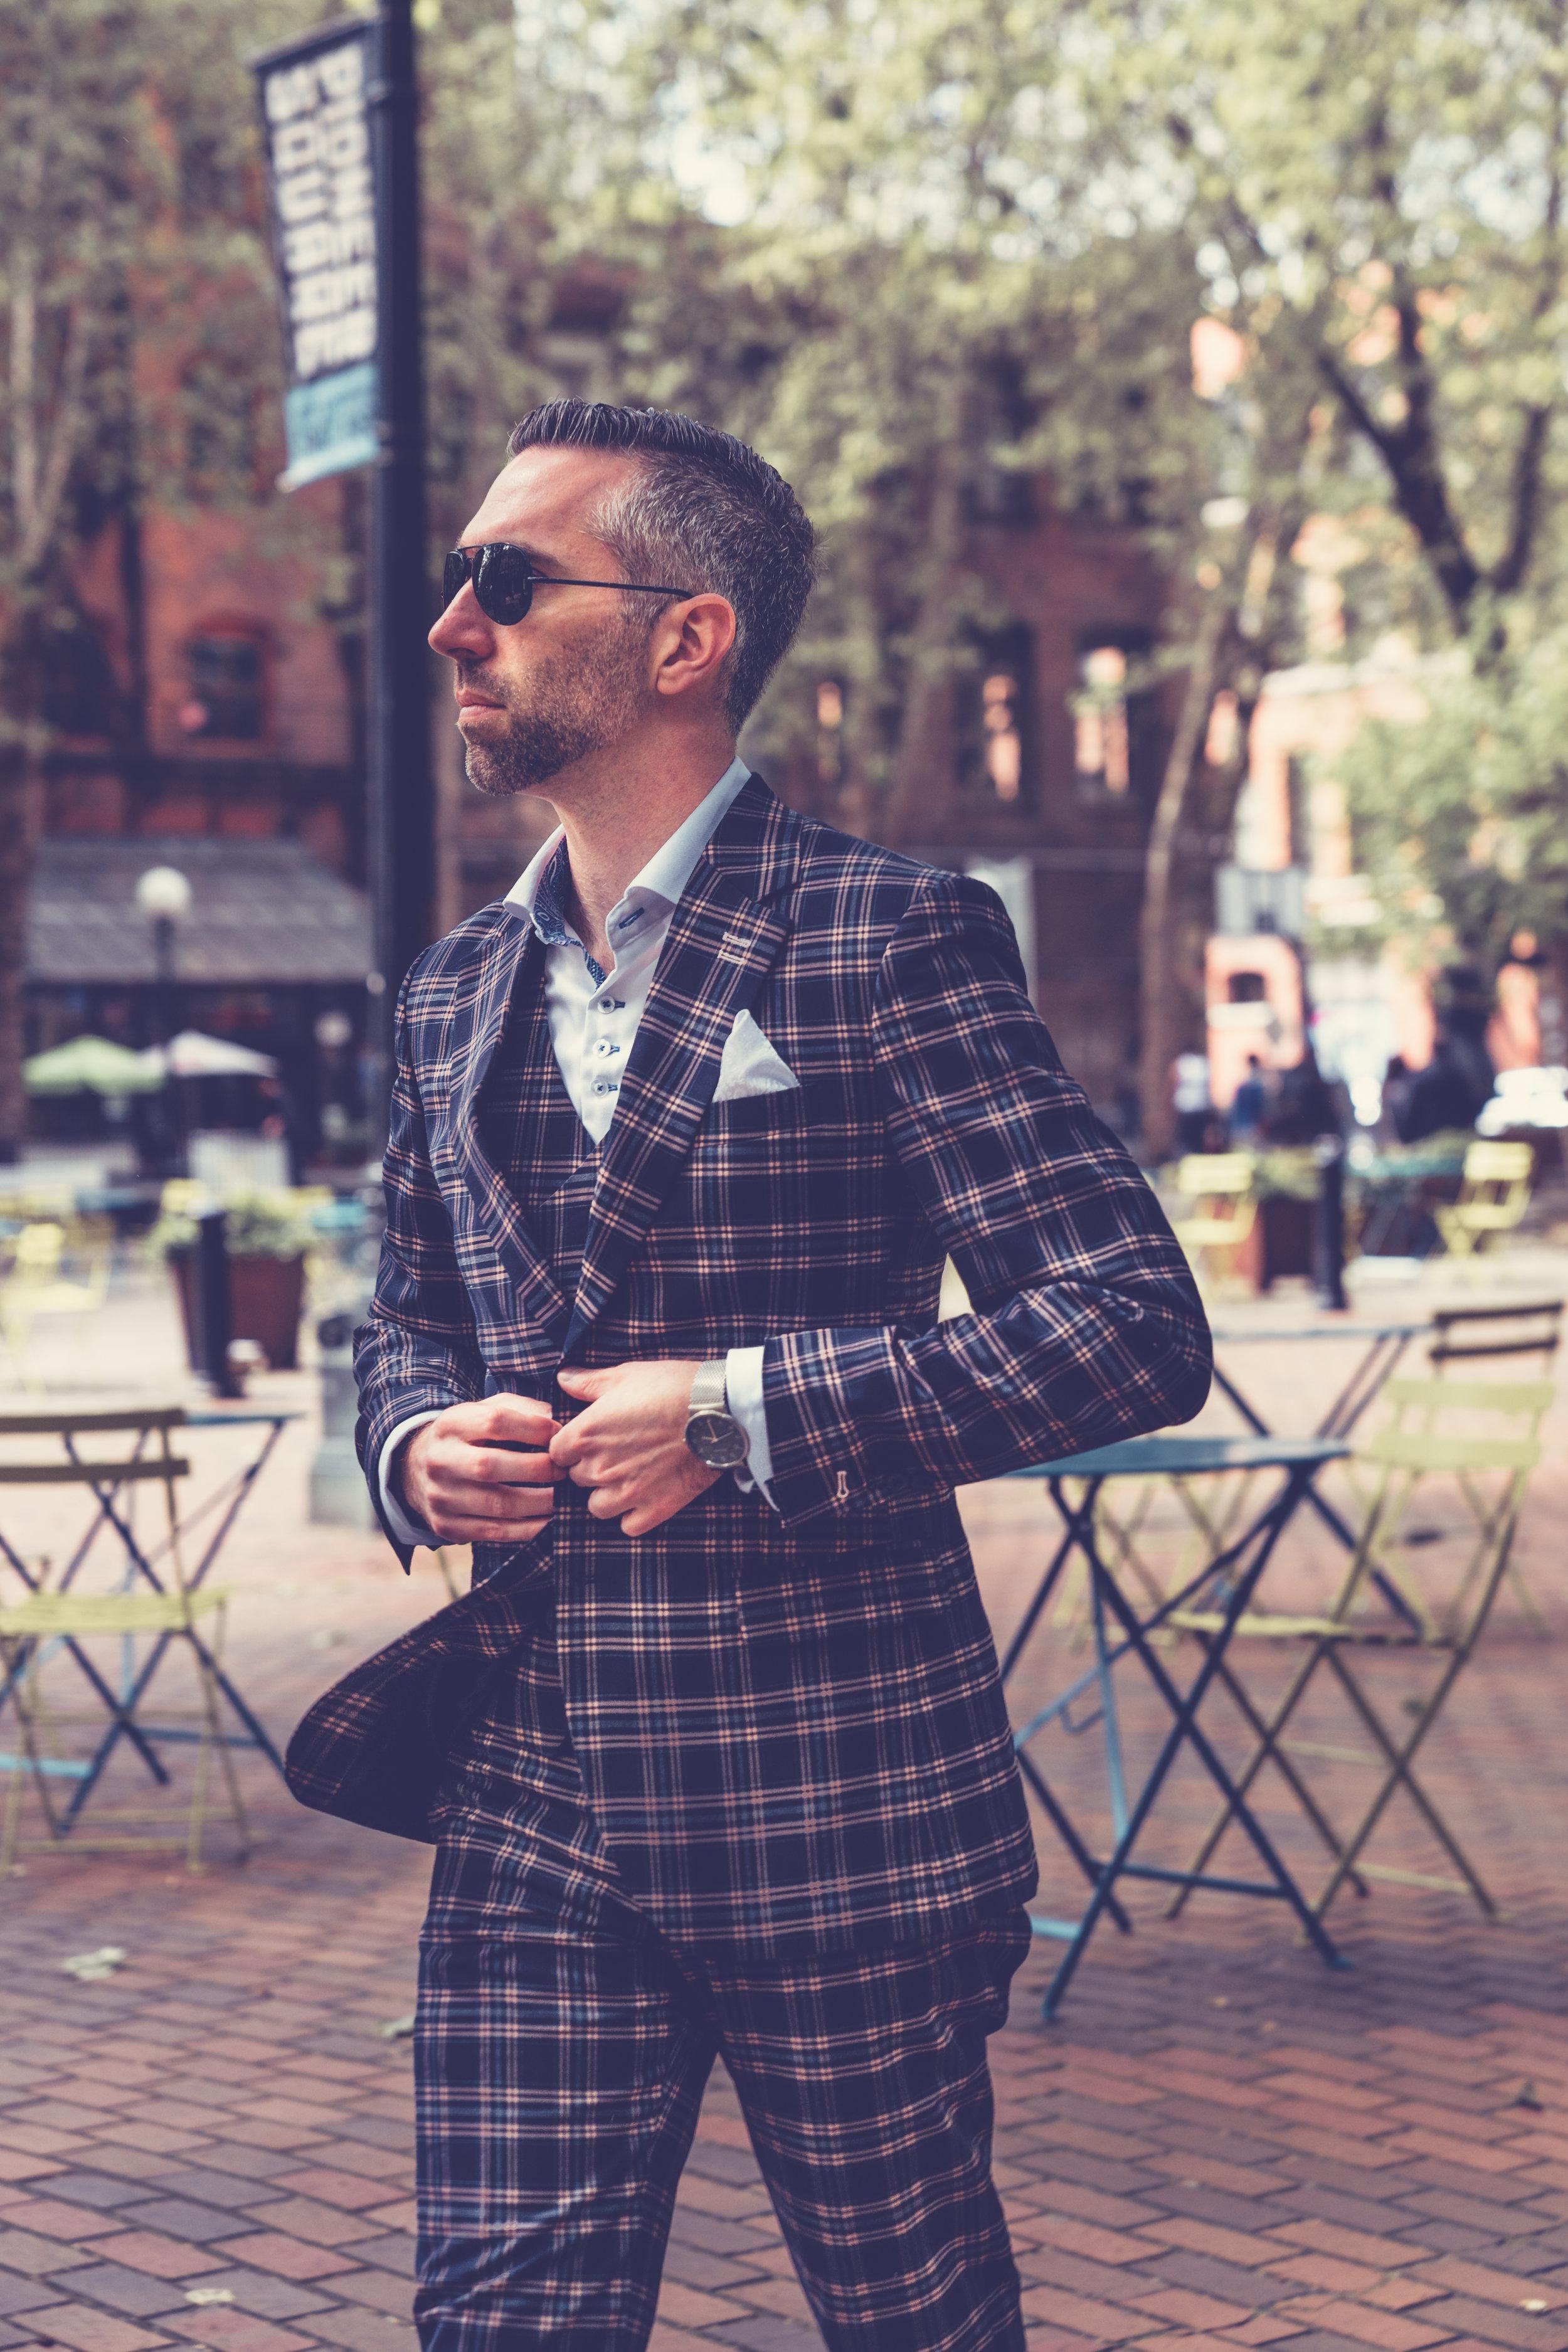 3-piece suit ($140), dress shirt ($24)